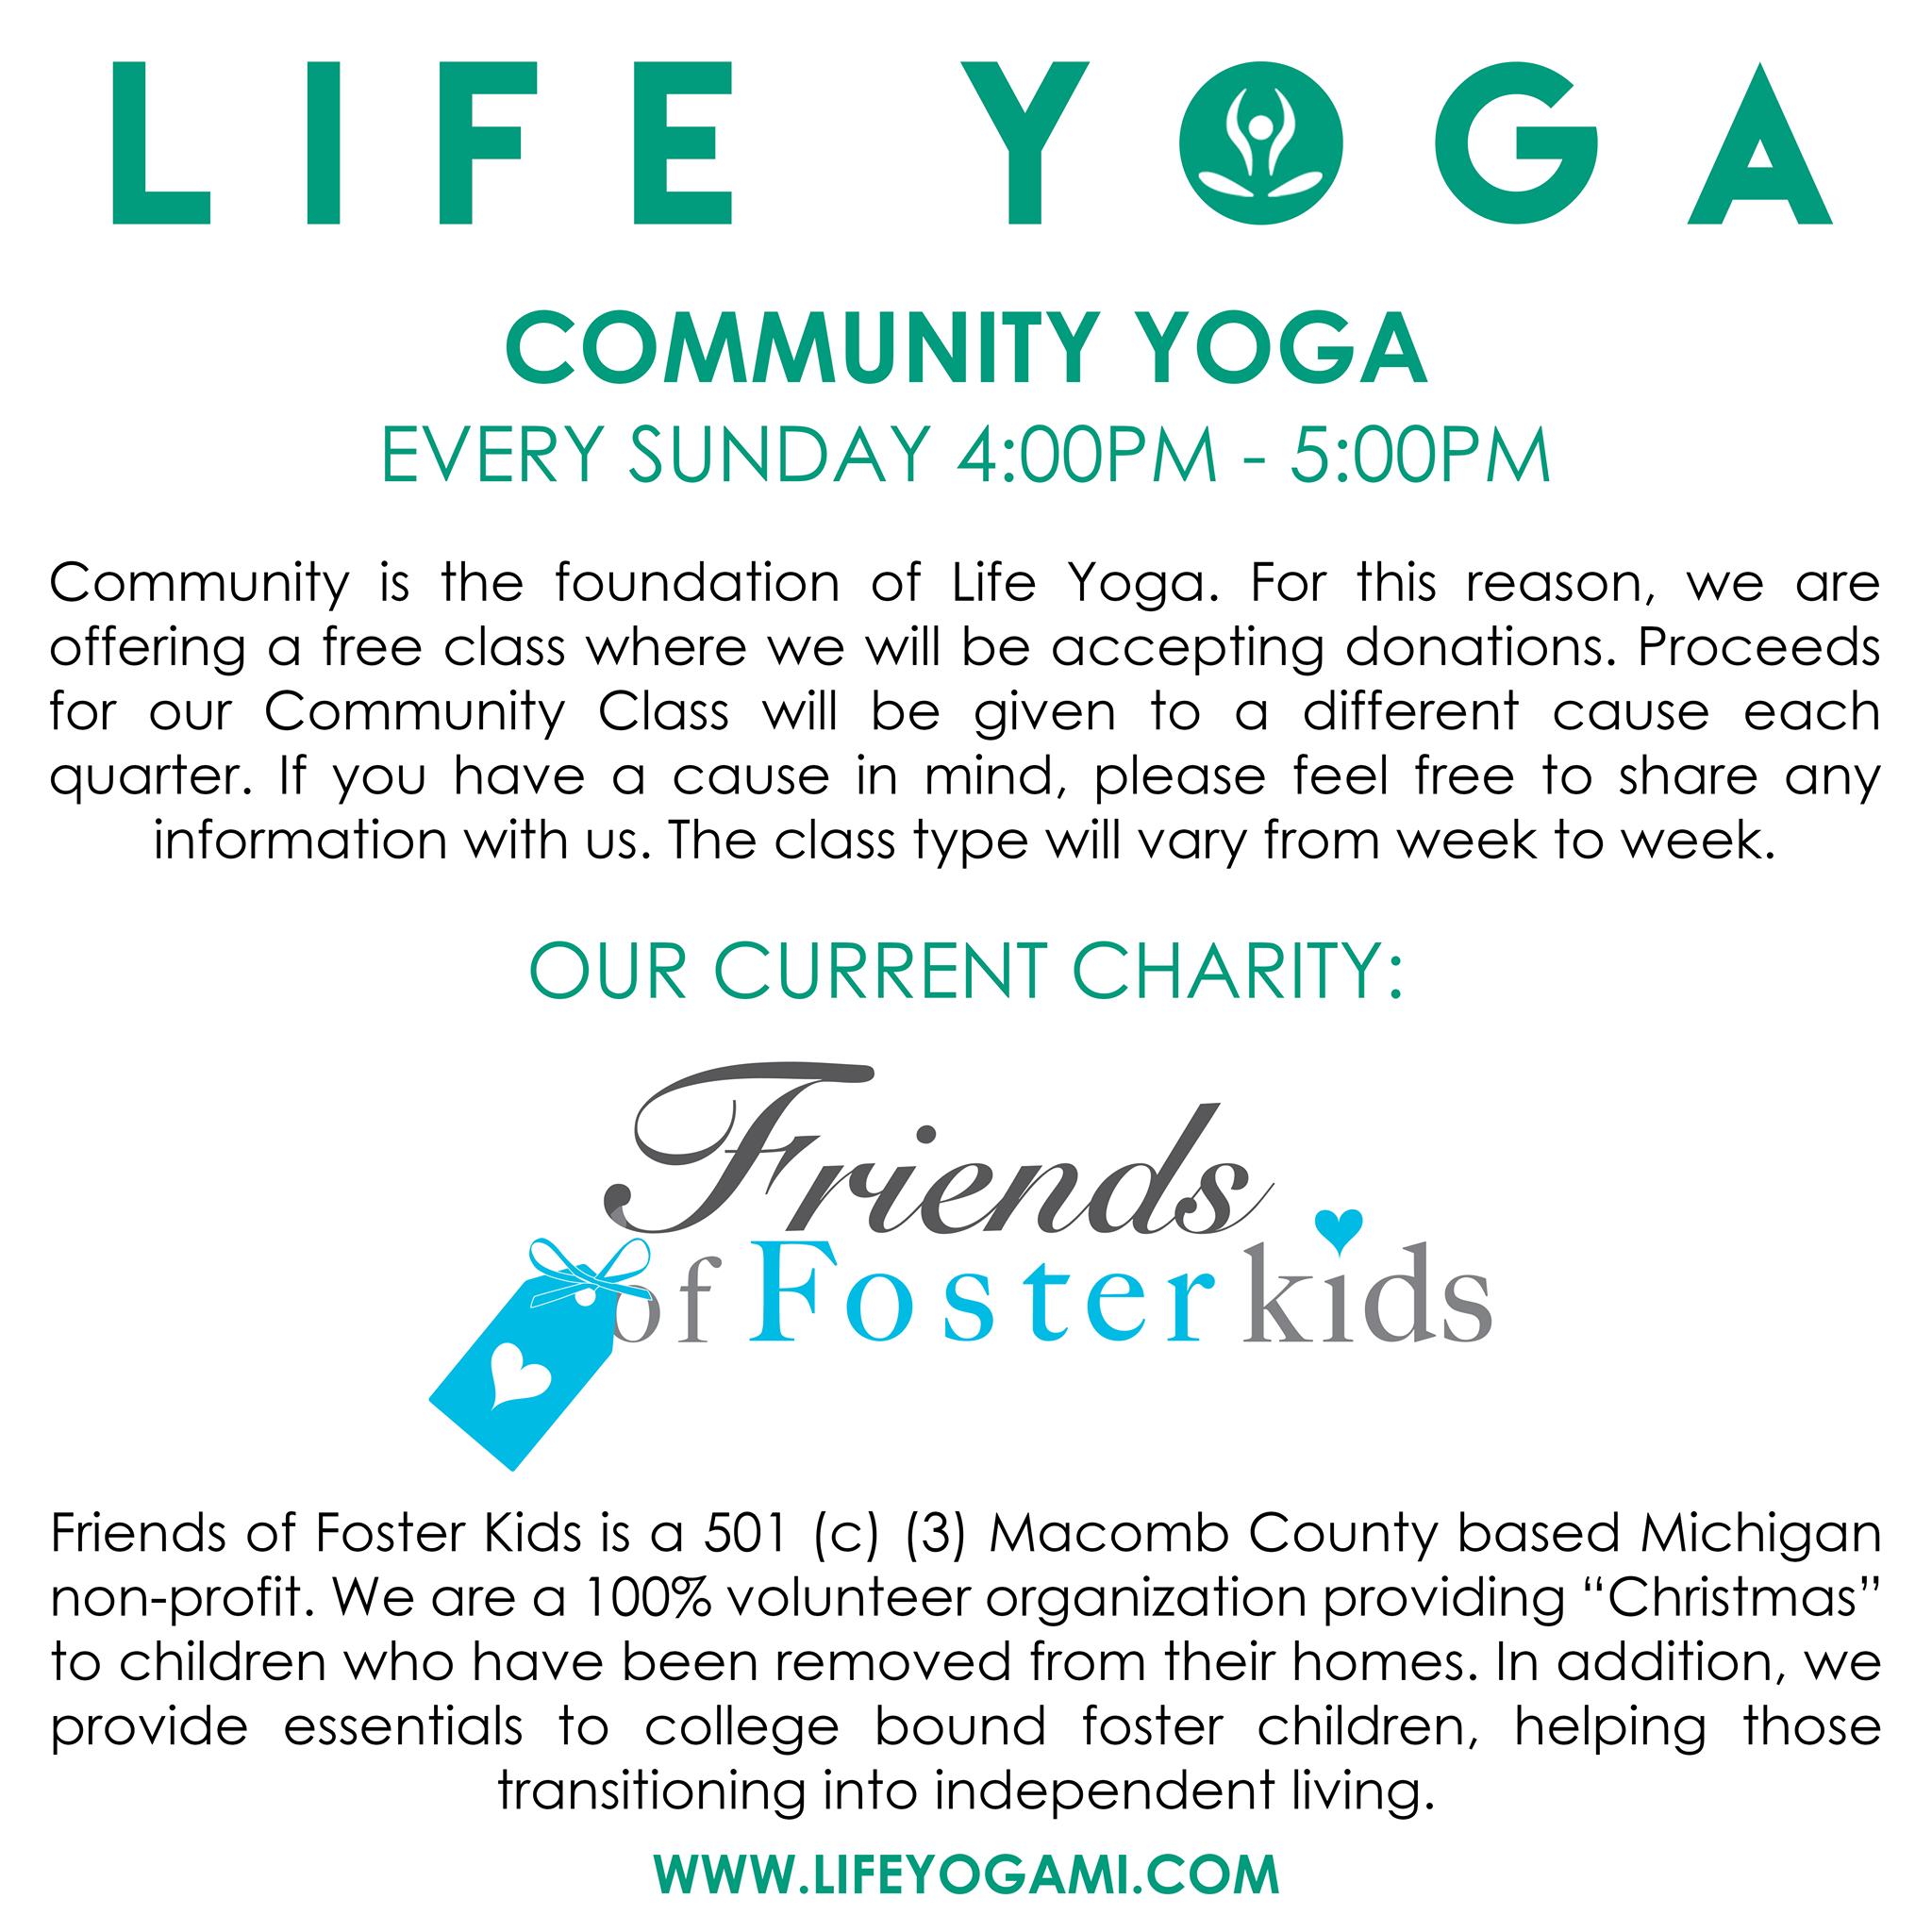 e034b8f110f Life Yoga Community Classes Benefiting Friends of Foster Kids ...